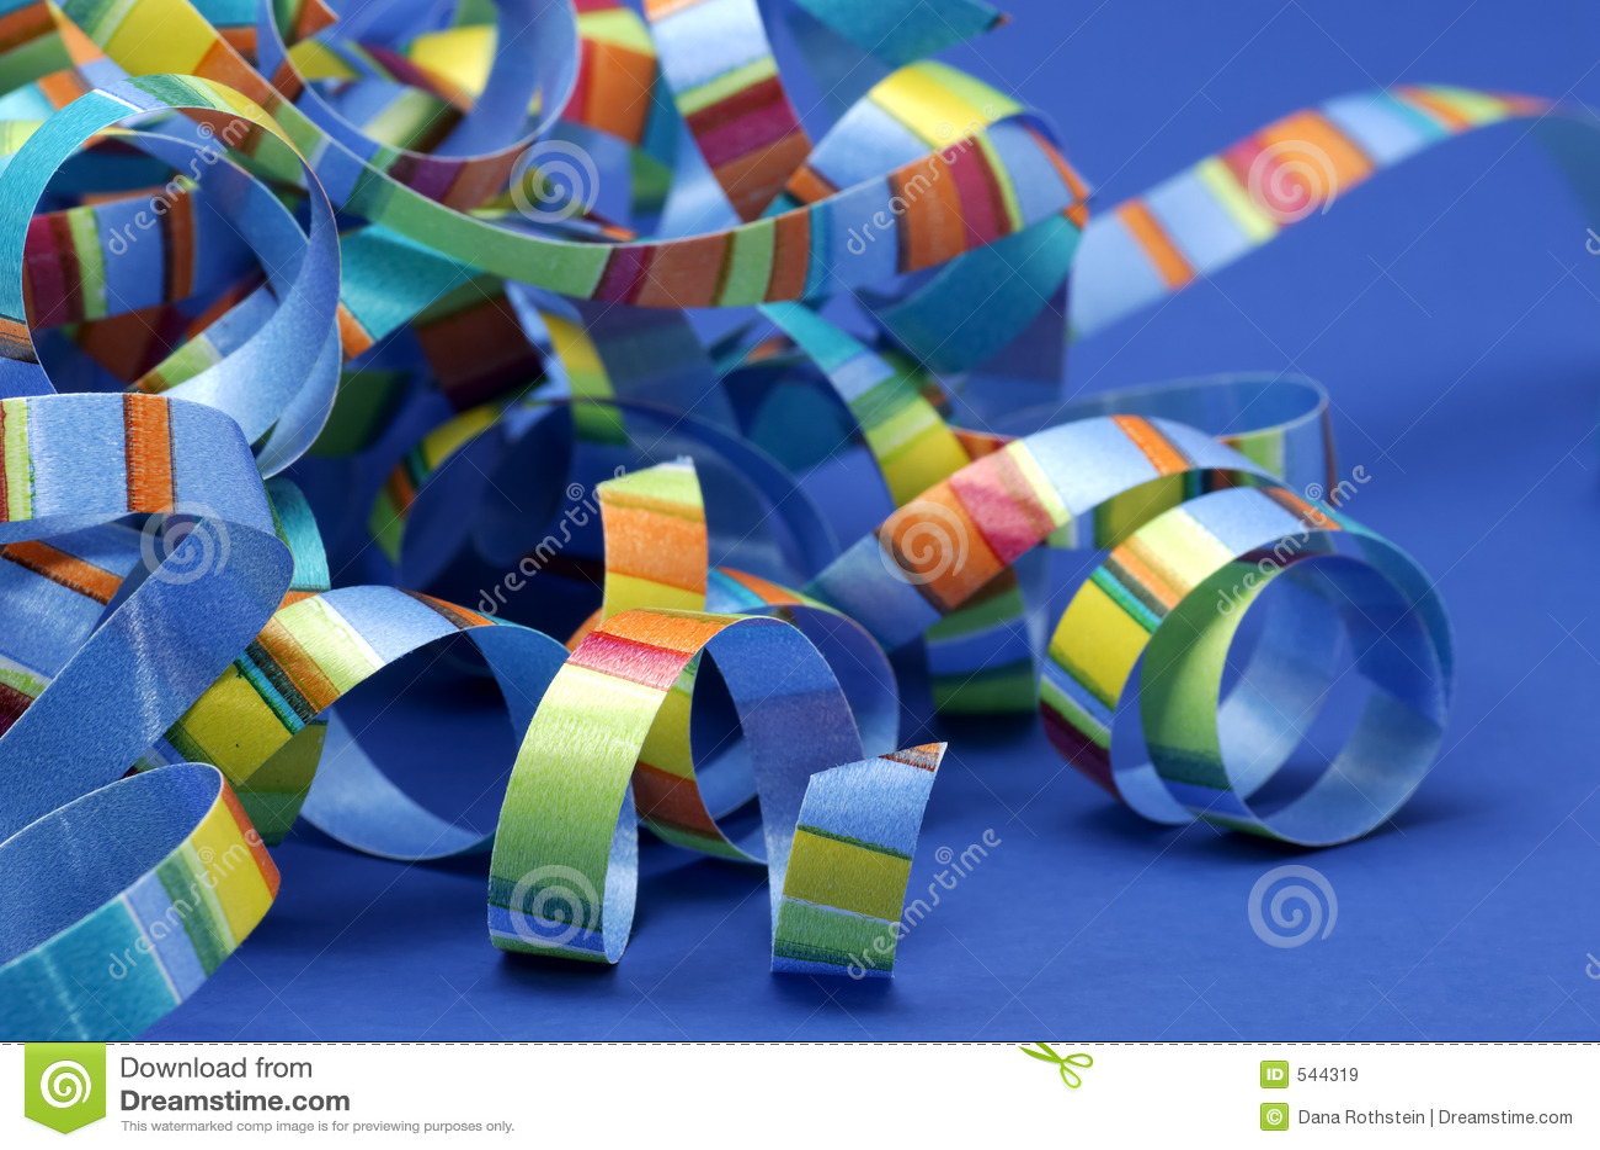 Download 五颜六色的丝带 库存图片. 图片 包括有 卷毛, 丝带, 装饰, 换行, 抽象, 五颜六色, 礼品, 生日, 存在 - 544319